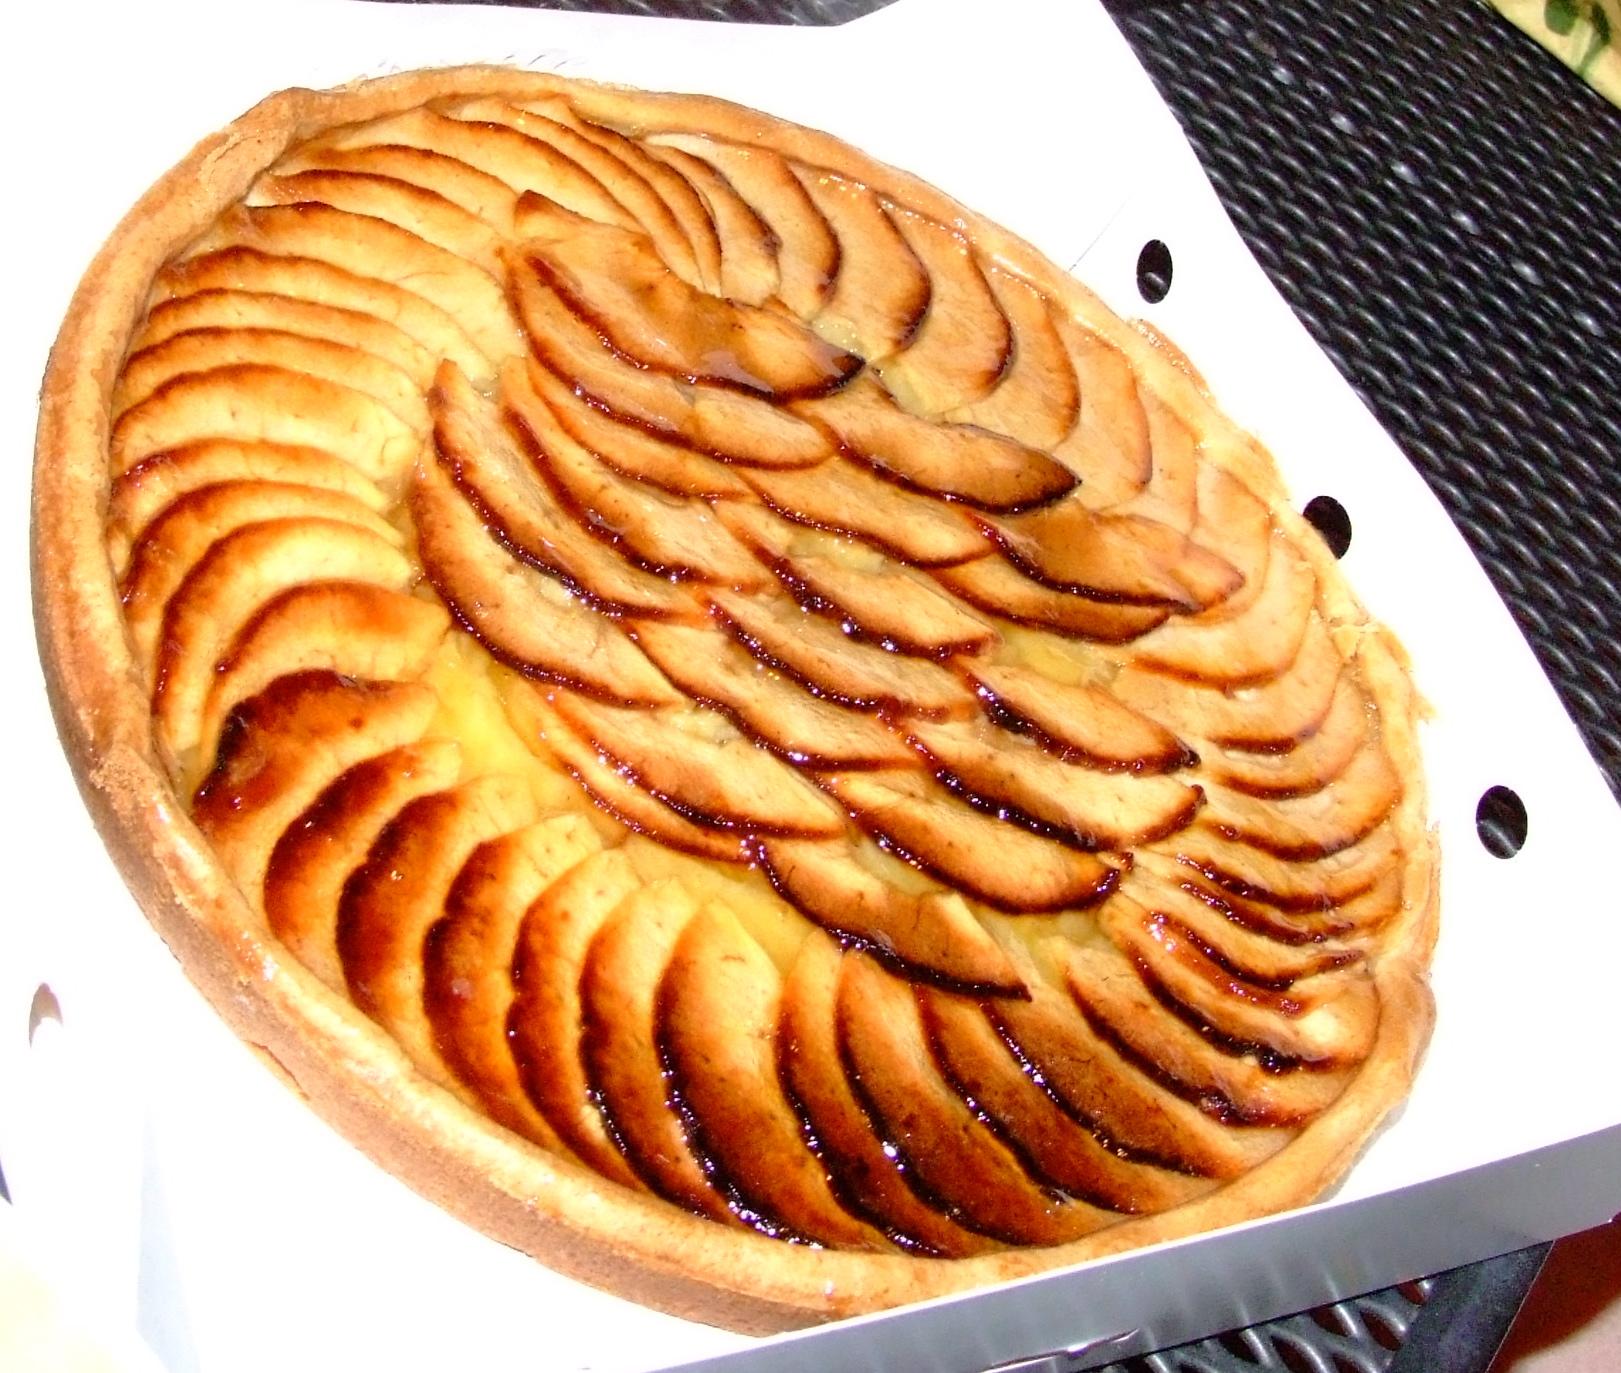 File:French apple tart by Gaeten Lee.jpg - Wikimedia Commons